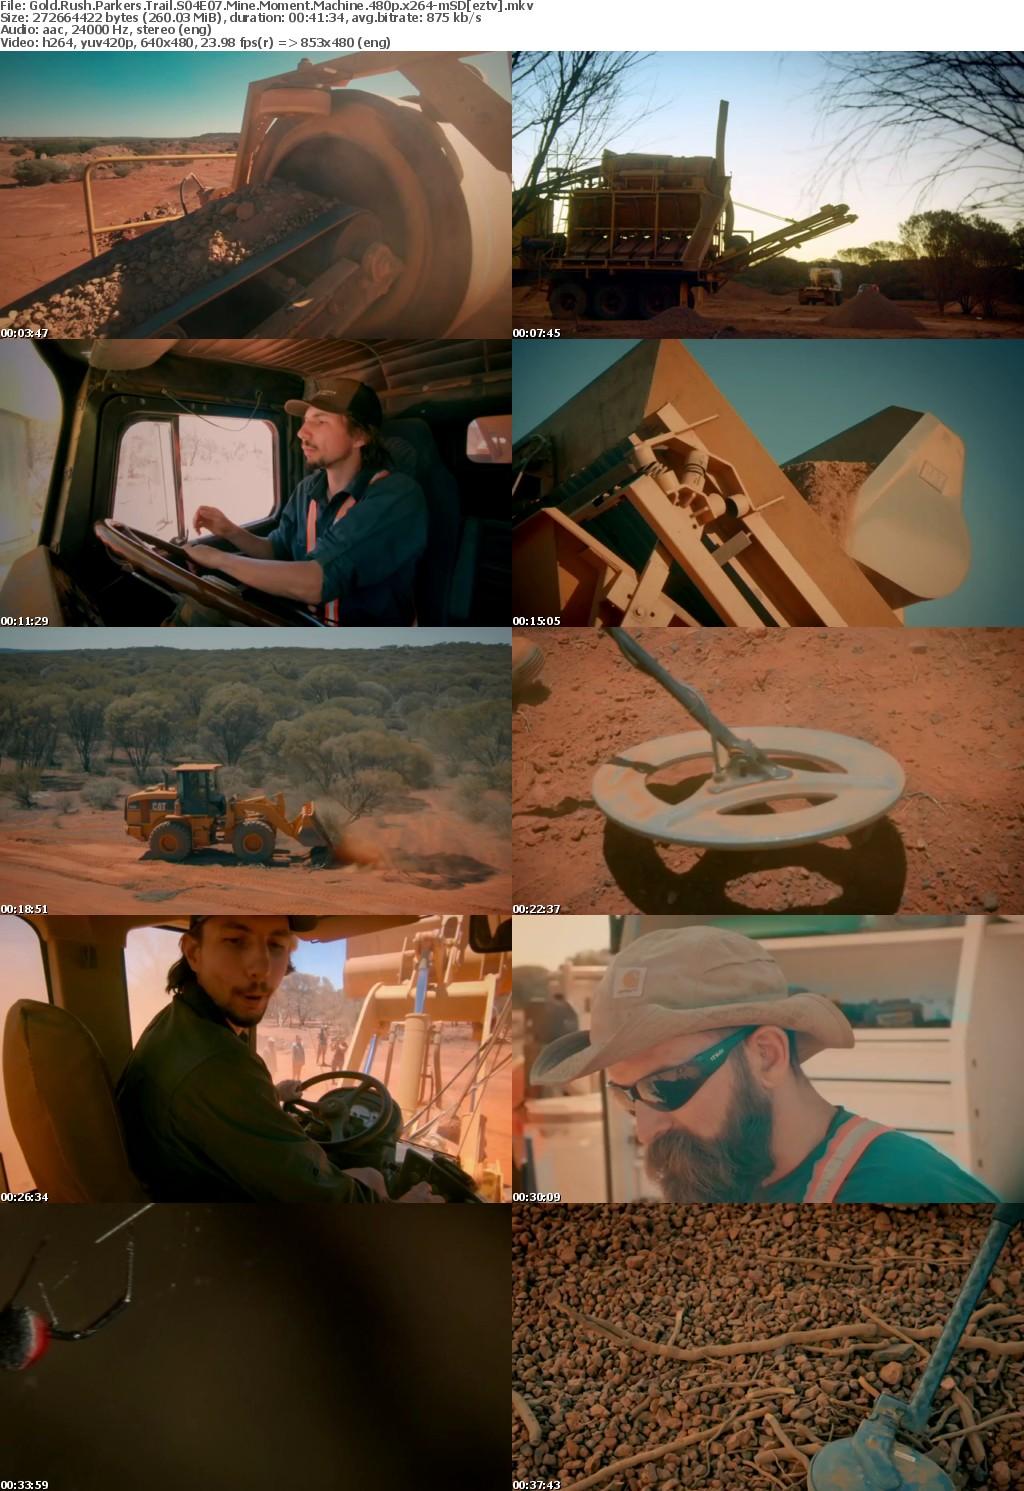 Gold Rush Parkers Trail S04E07 Mine Moment Machine 480p x264-mSD